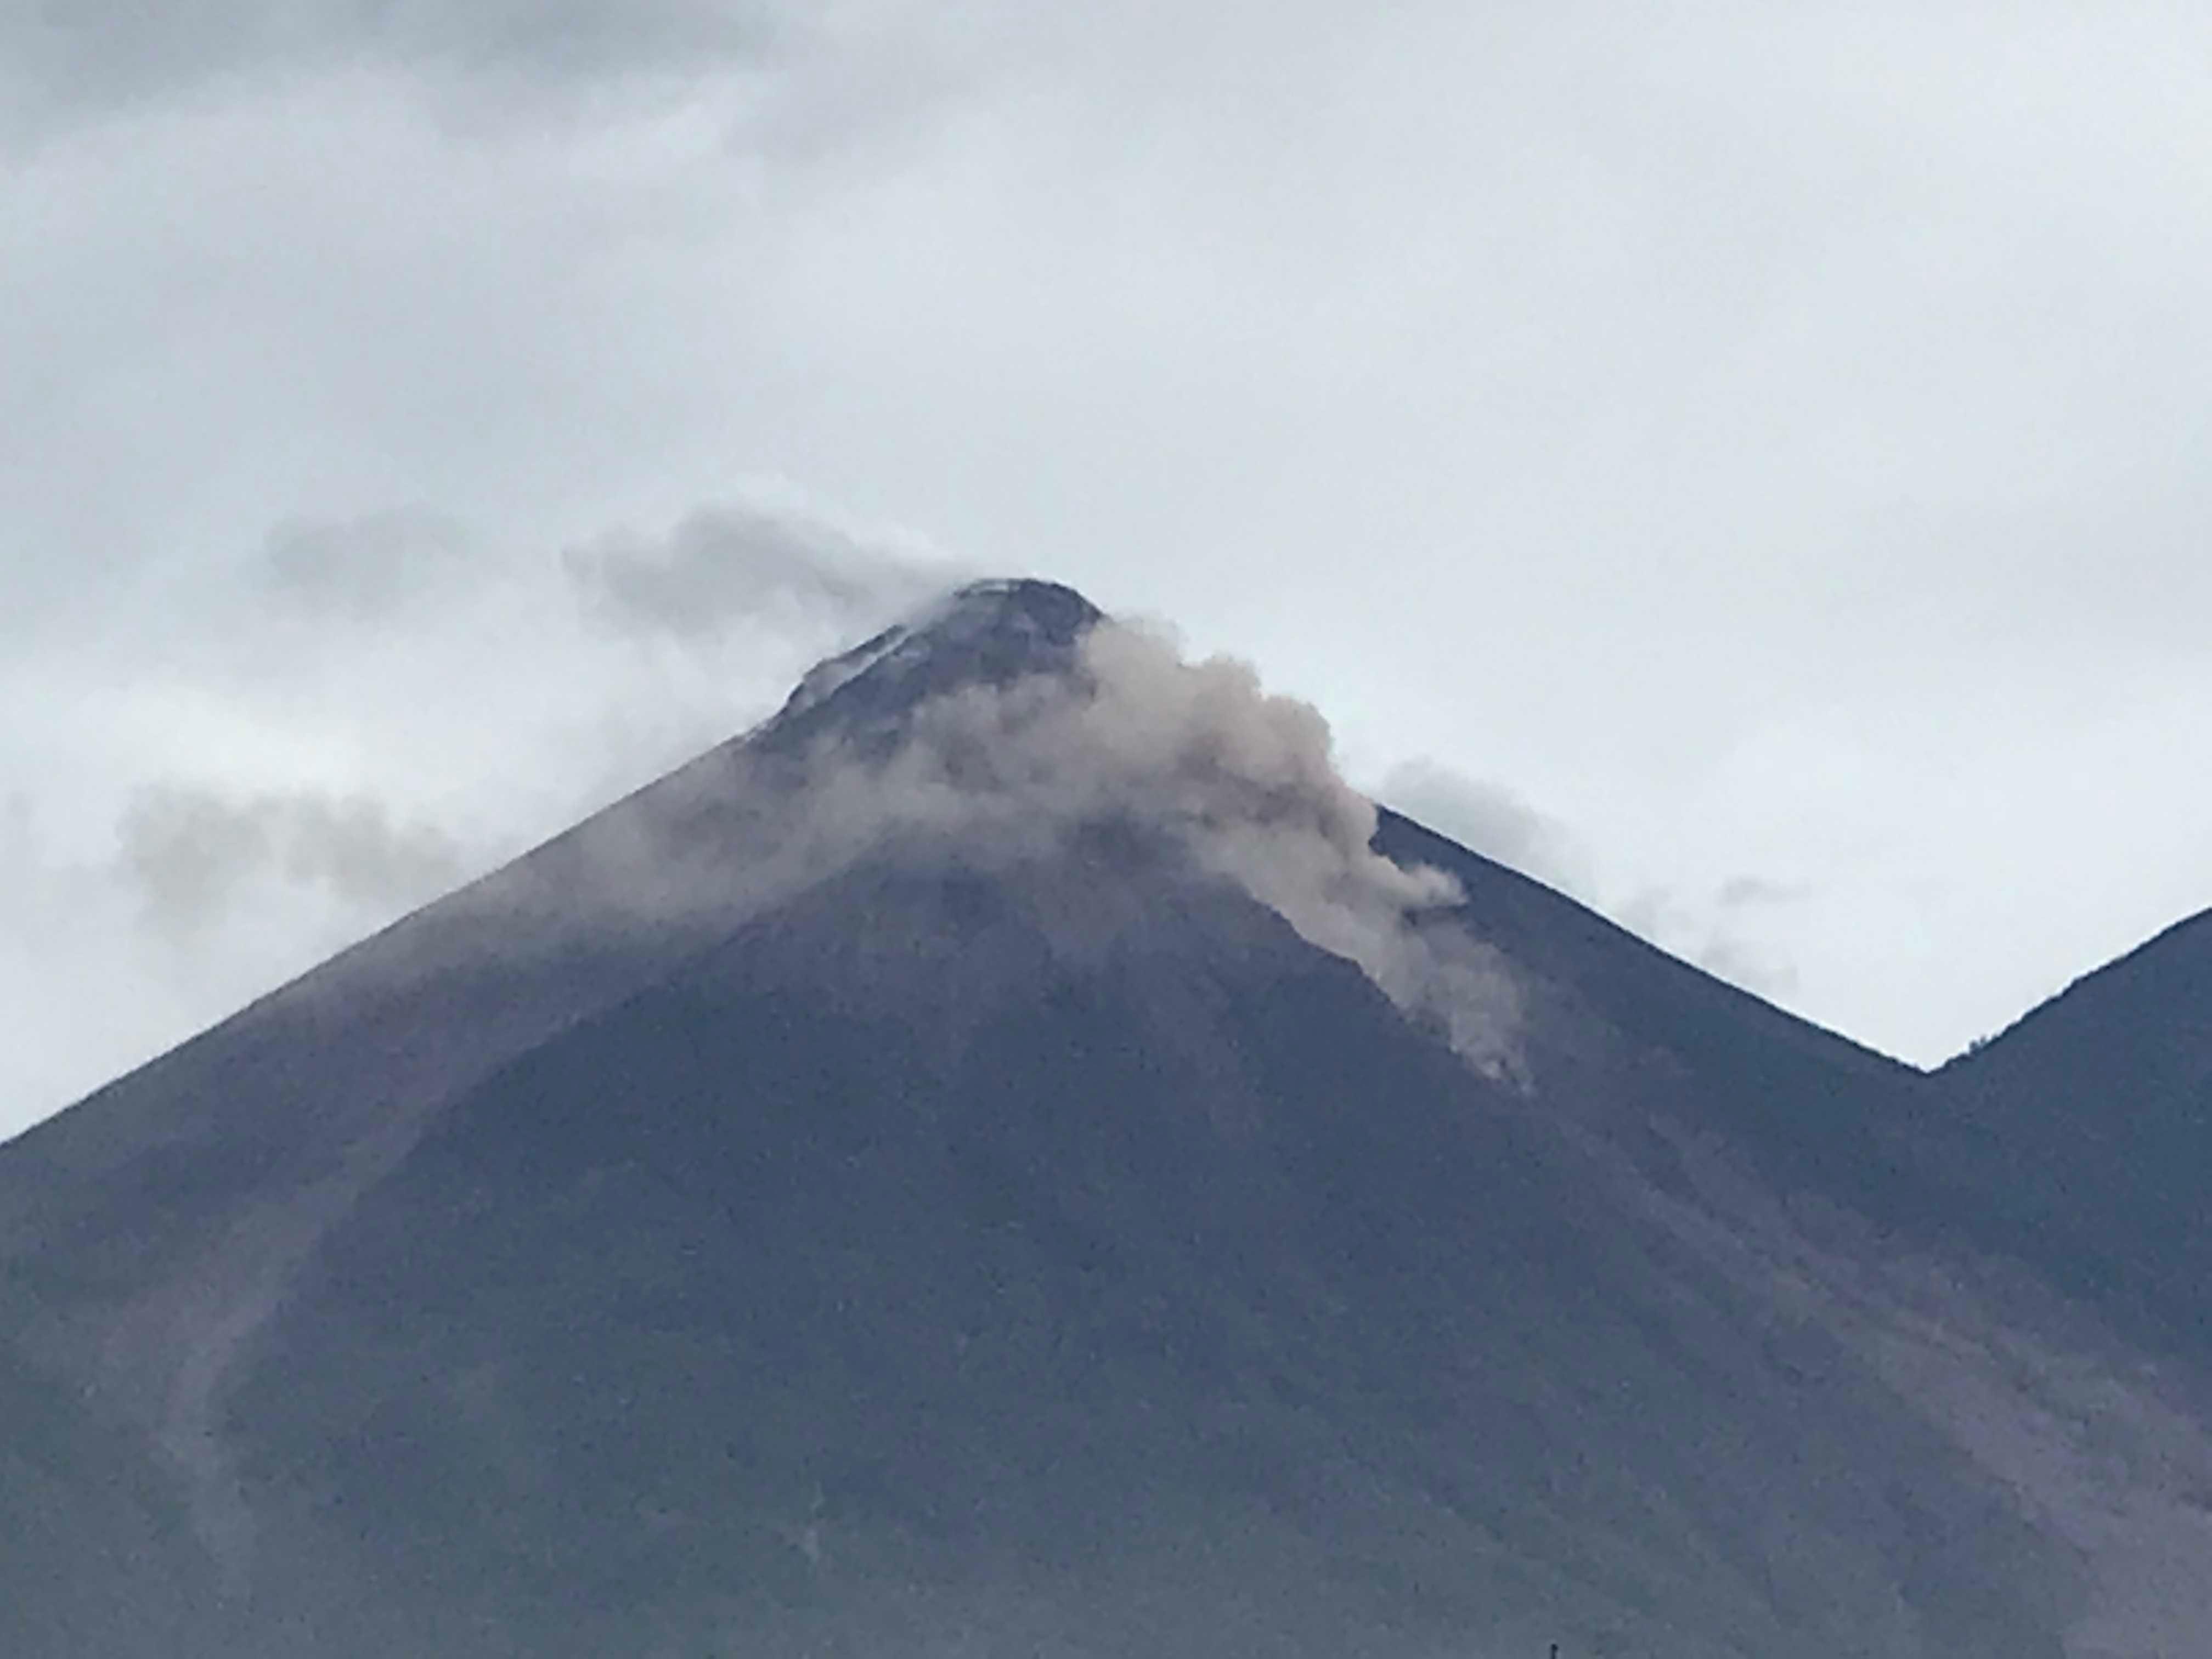 Alertan de descenso de lahar del volcán Santiaguito de Guatemala